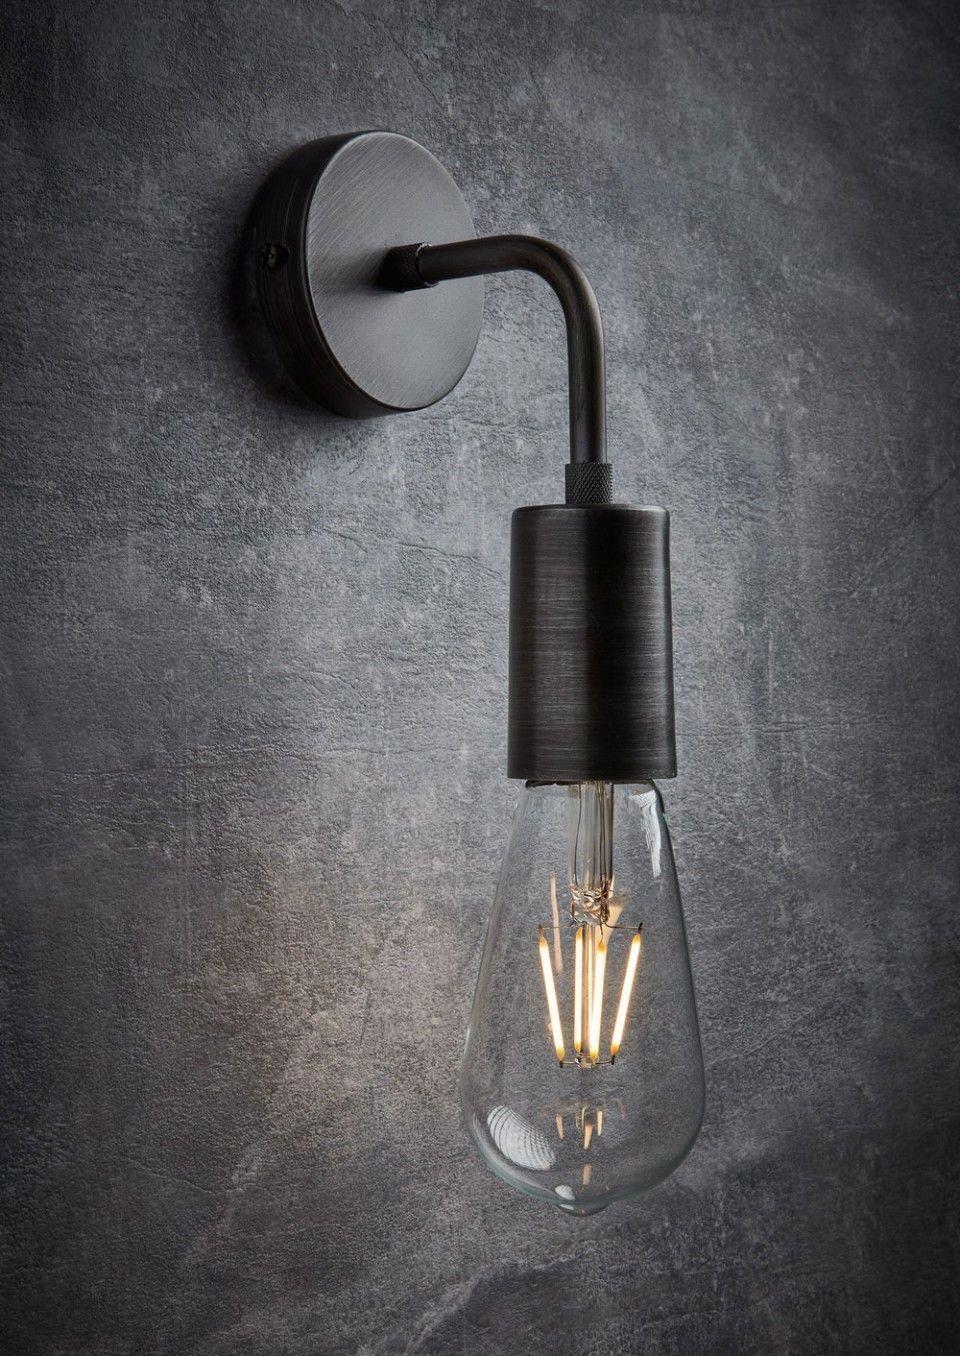 Vintage Sleek Edison Wall Light In Pewter Urban Style Industrial Lighting By I Industrial Light Fixtures Vintage Industrial Lighting Industrial Style Lighting